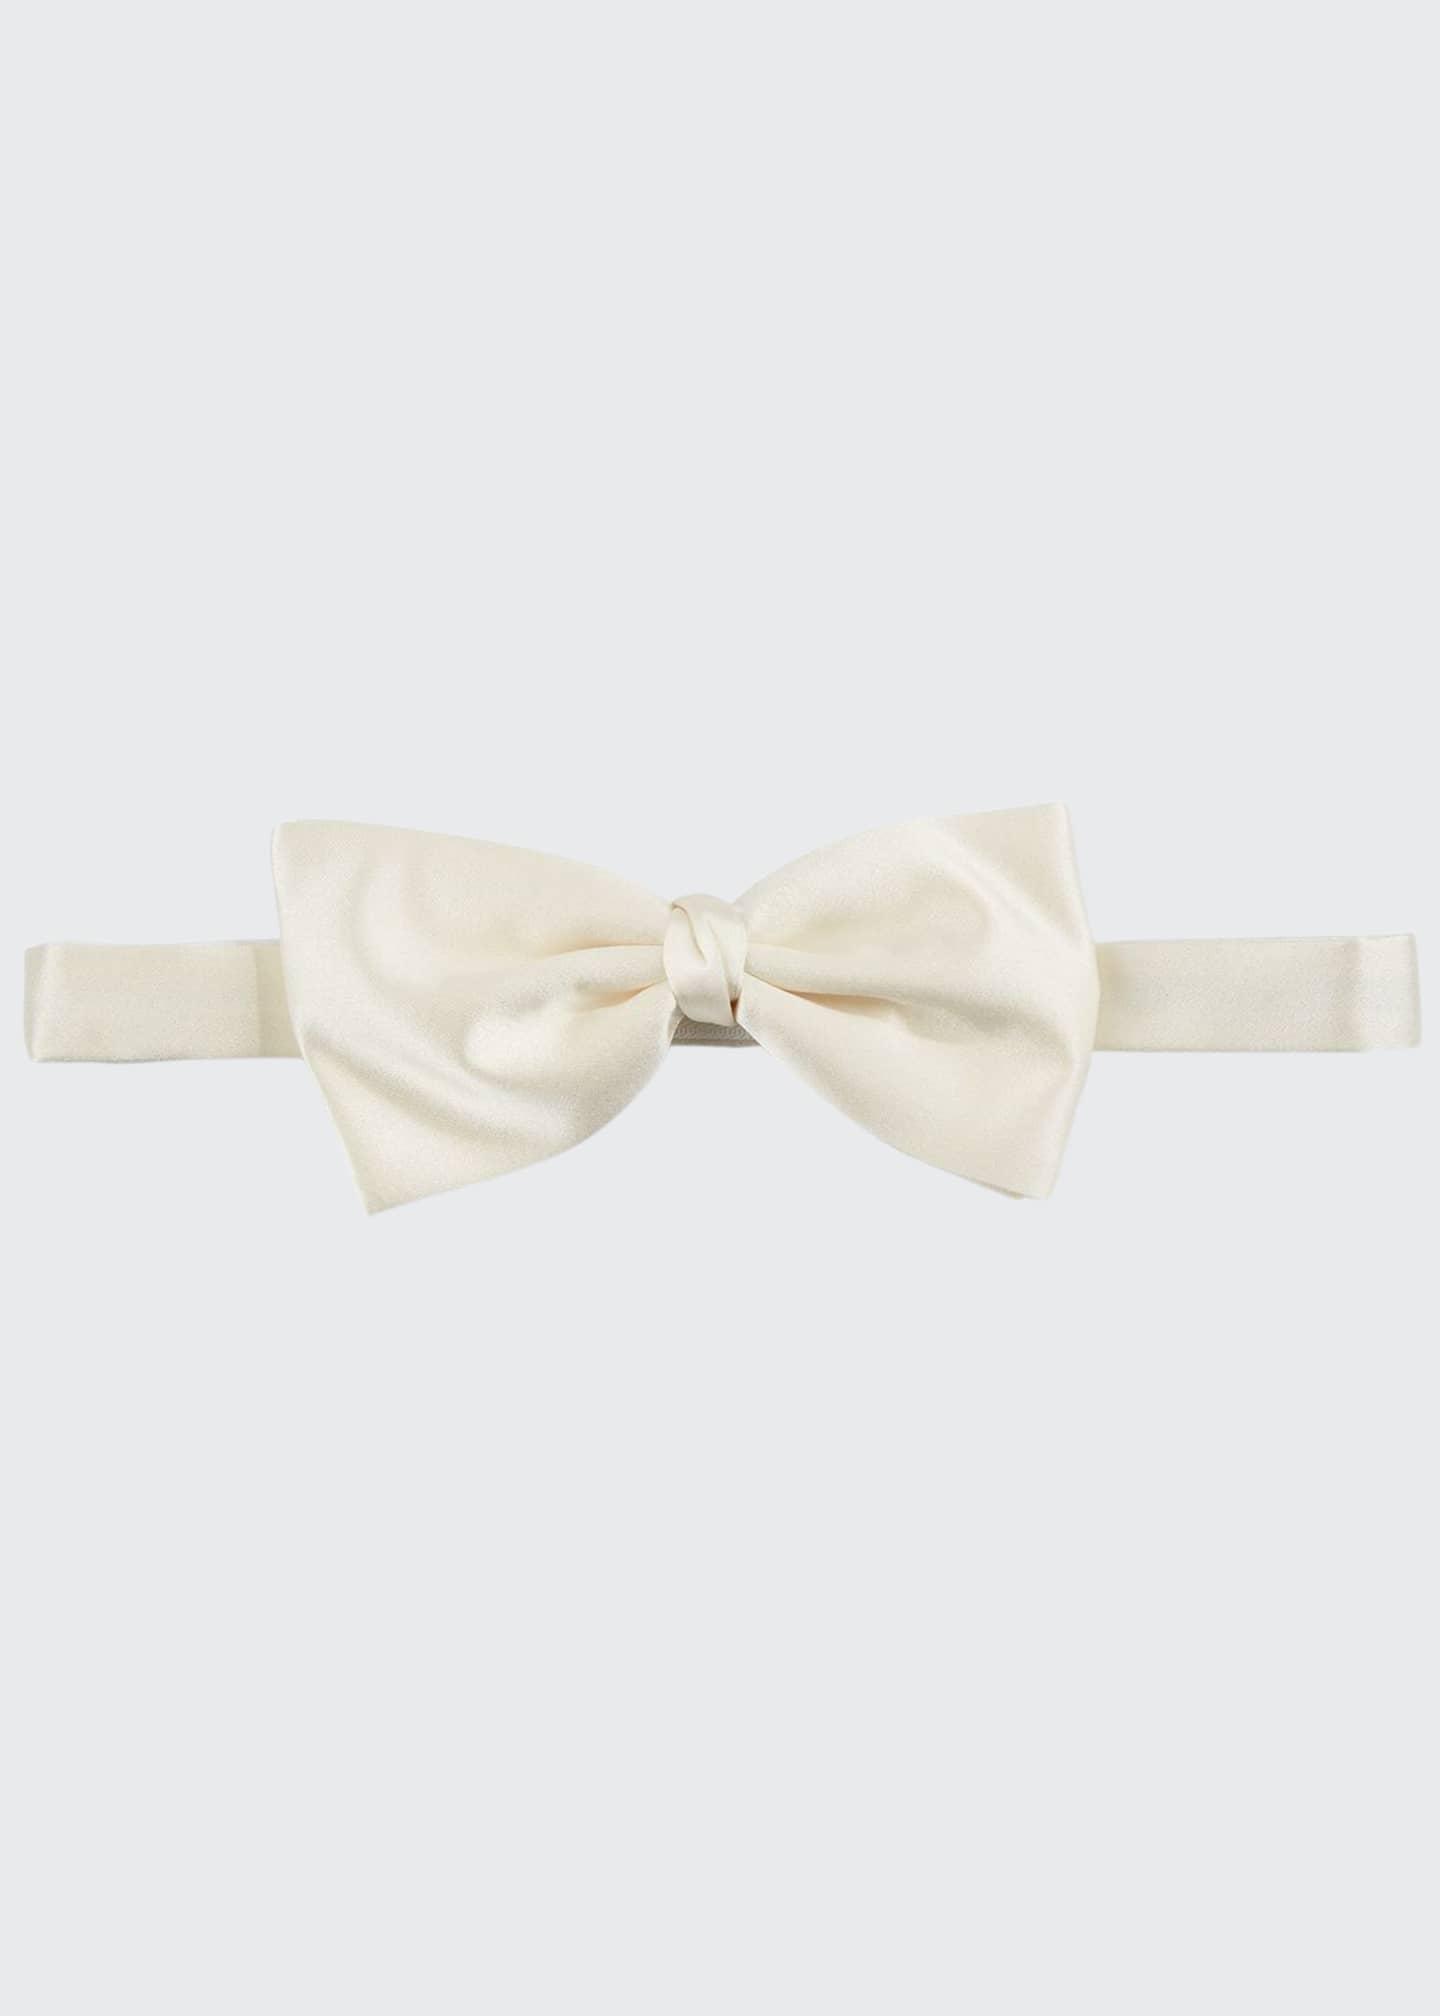 Ermenegildo Zegna Men's Satin Self-Tie Bow Tie